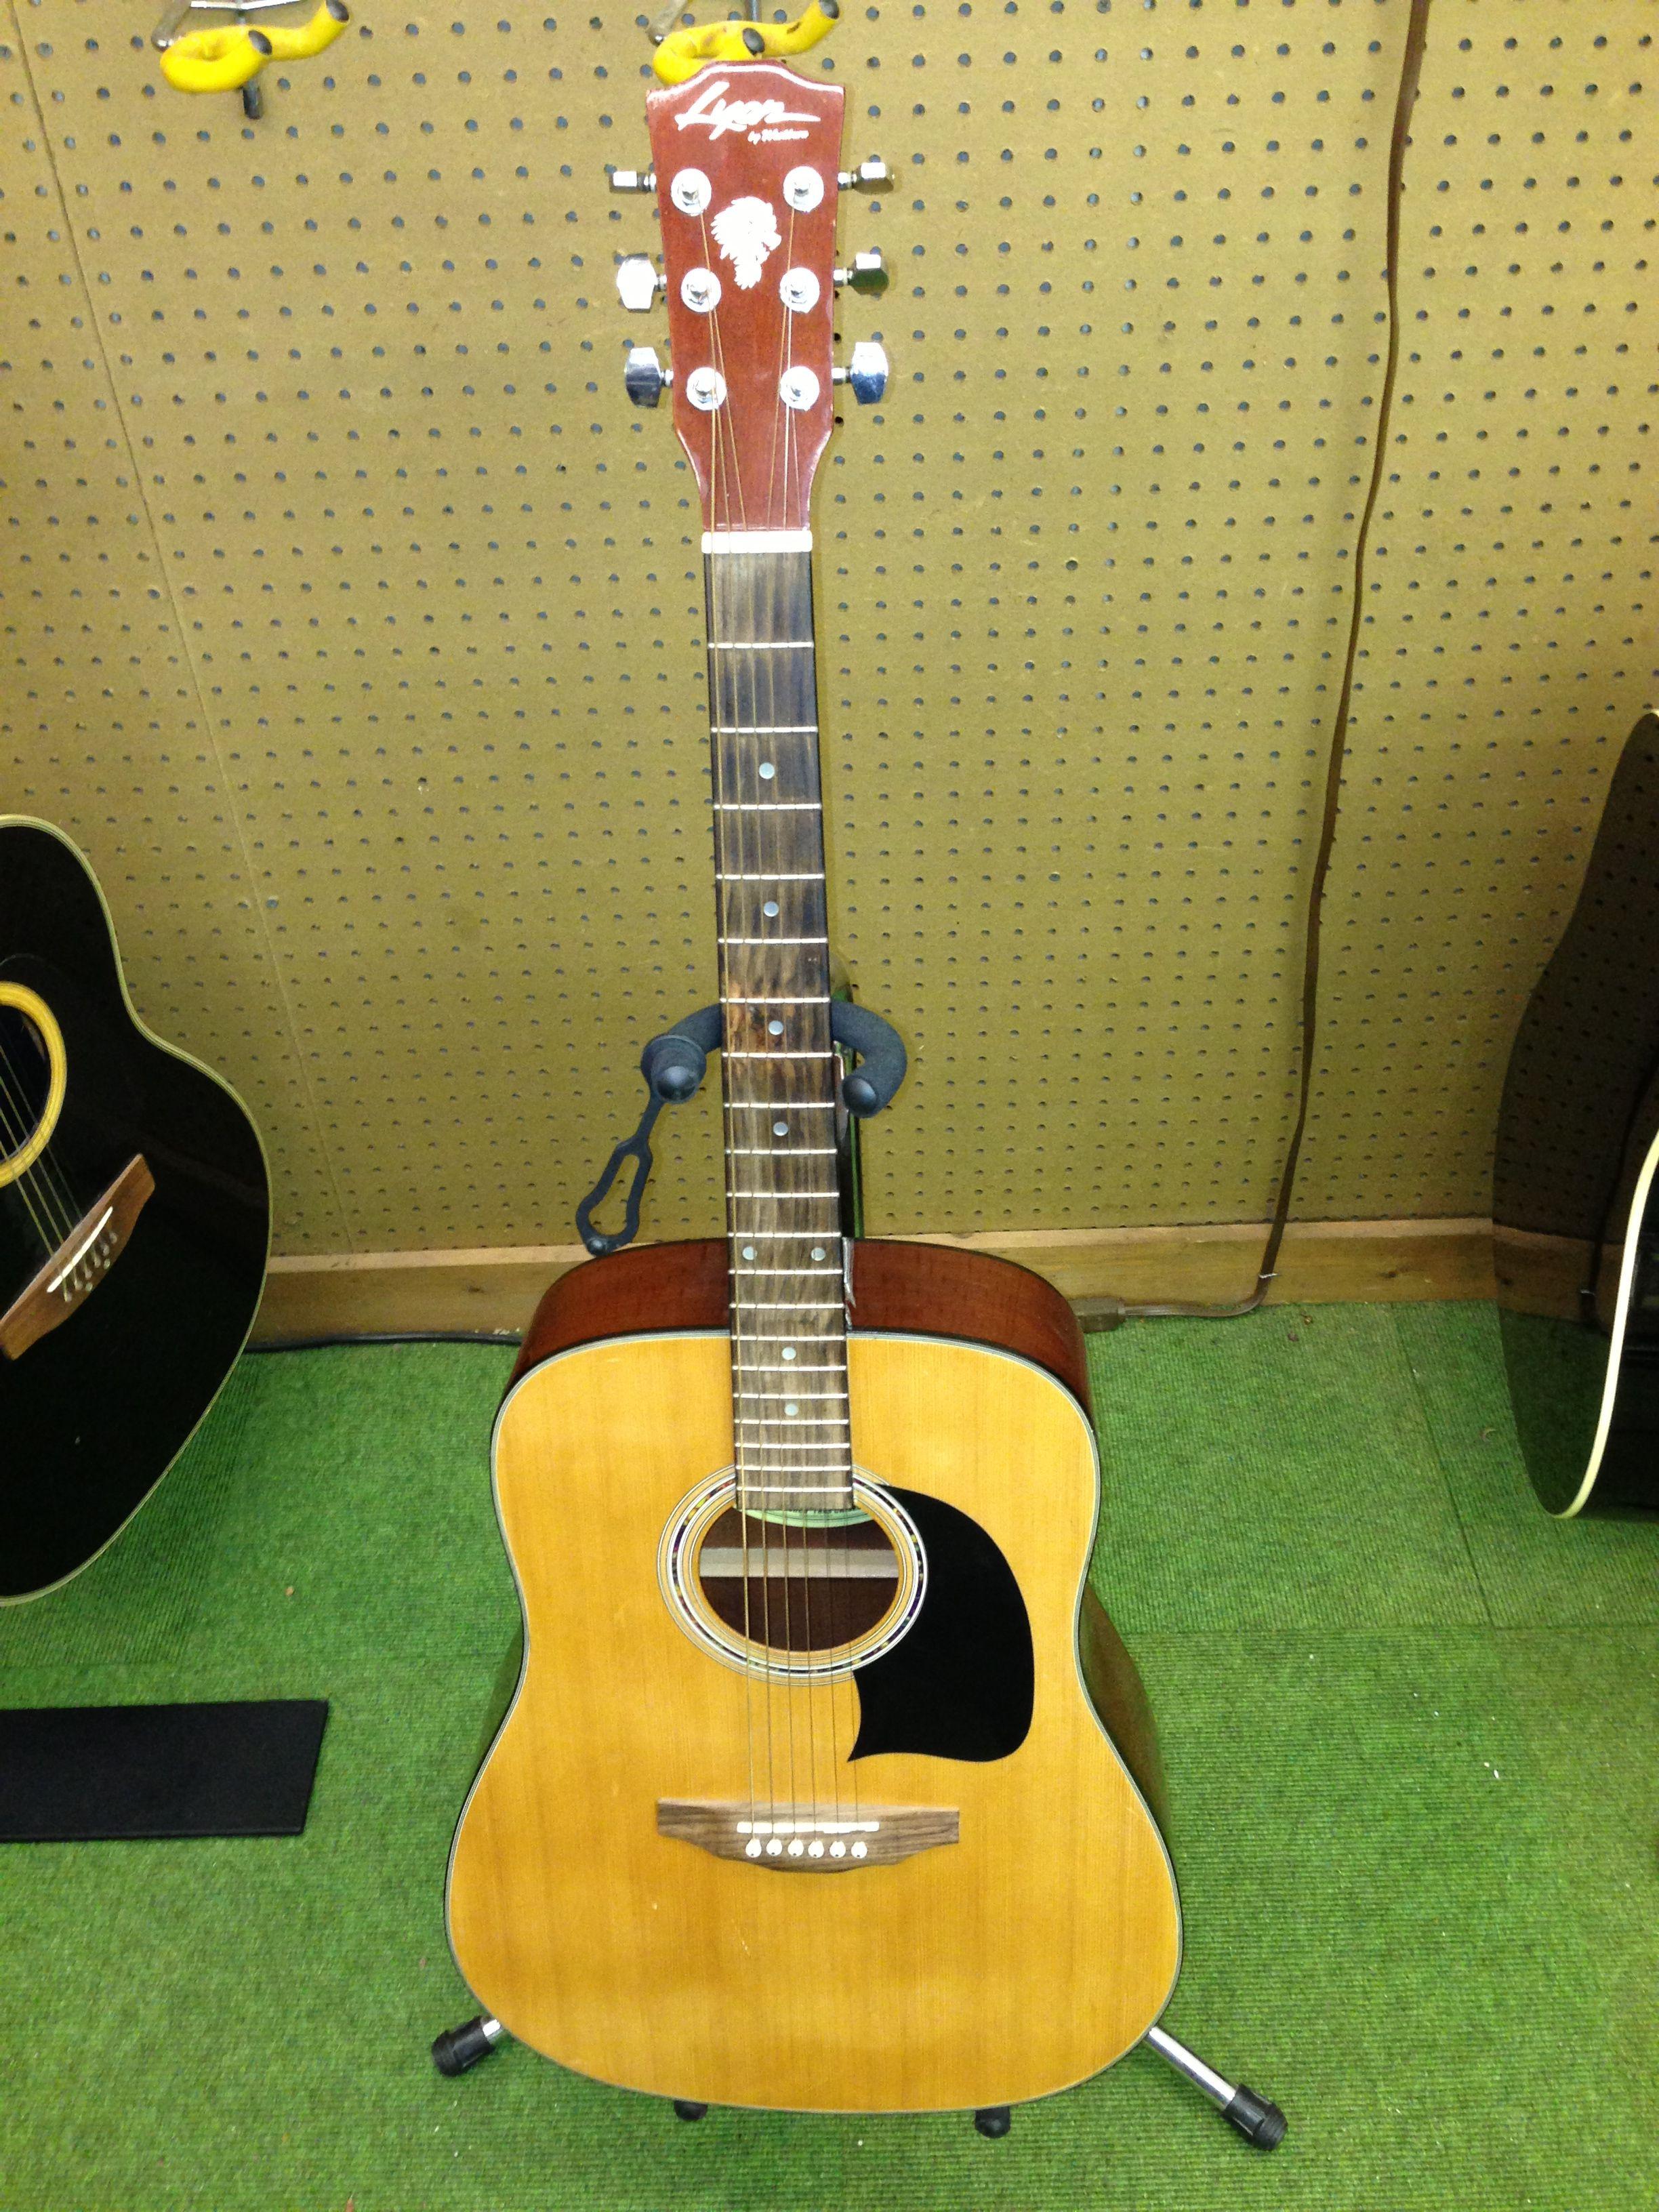 69 99 lyon by washburn model lg2tpak acoustic guitar musical